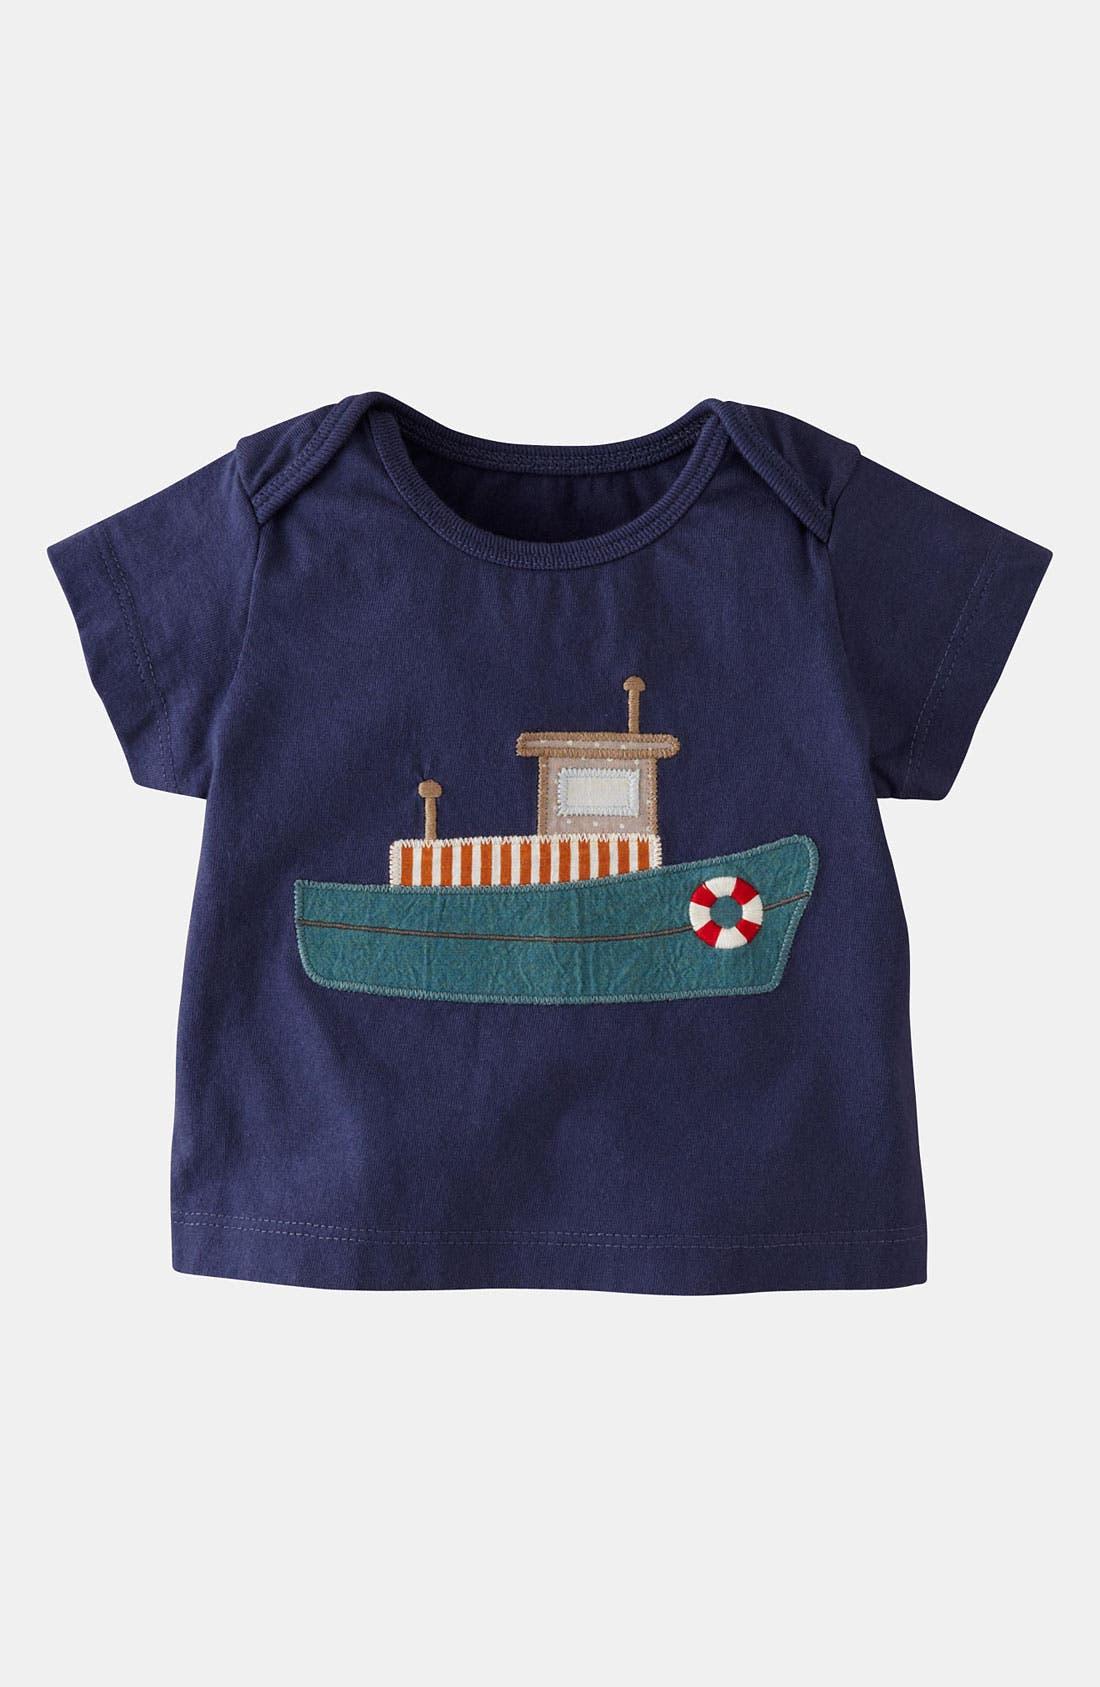 Alternate Image 1 Selected - Mini Boden 'Vehicle Appliqué' T-Shirt (Baby)